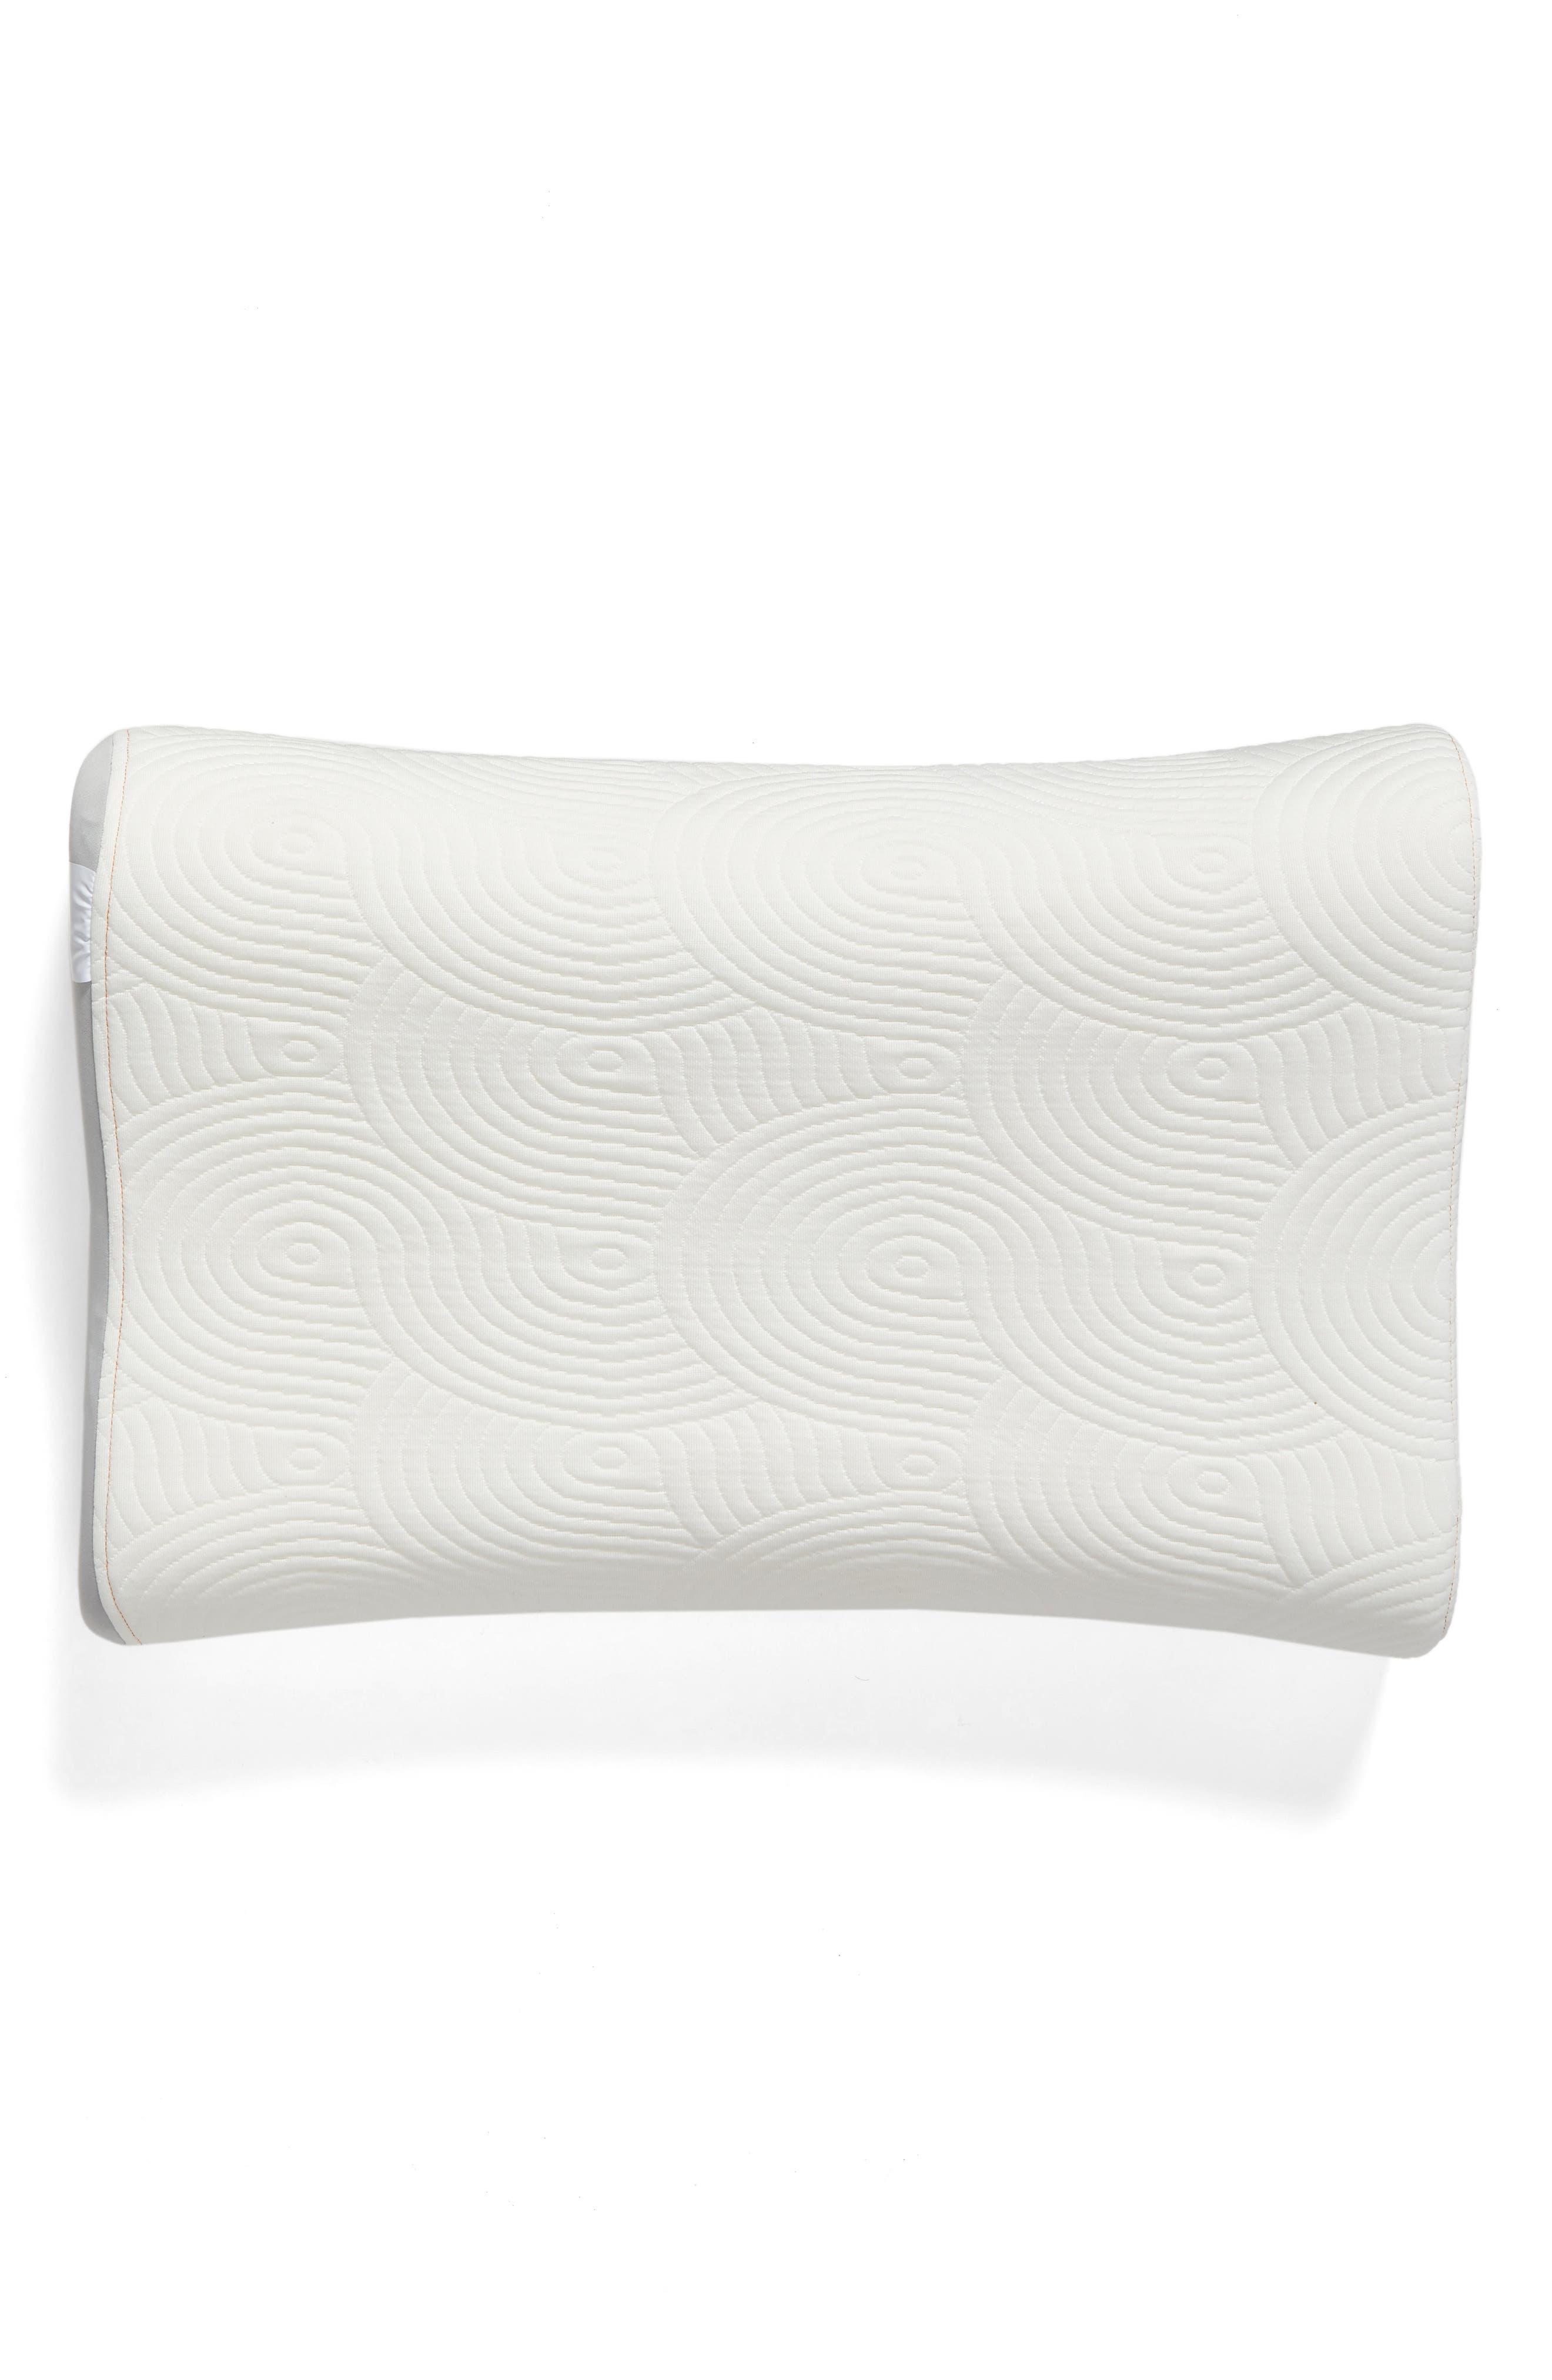 TEMPUR-Contour Side-to-Side Pillow,                         Main,                         color, WHITE